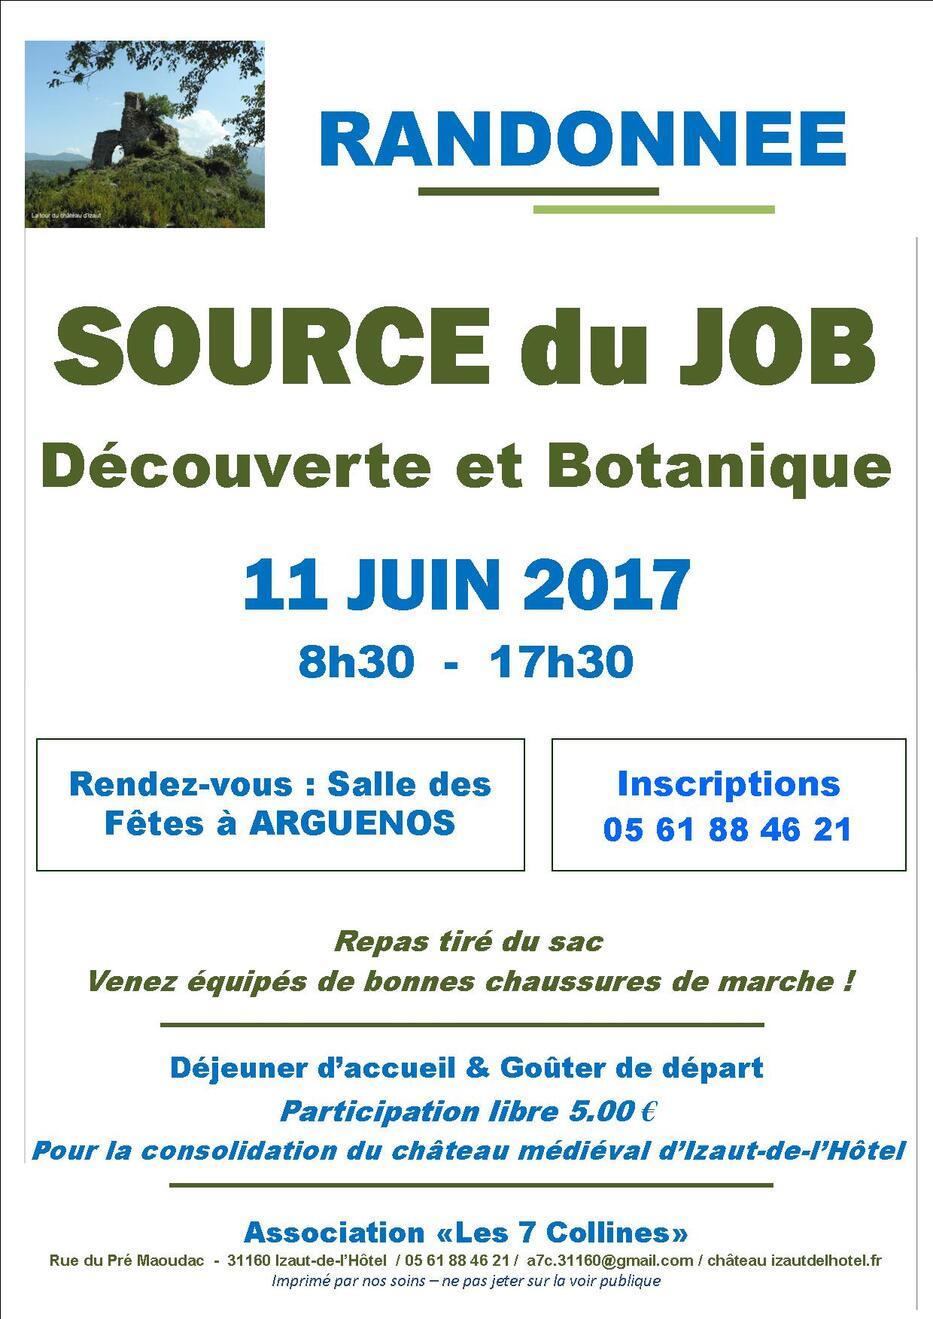 2017 : Promenade à la source du Job le 11 juin 2017